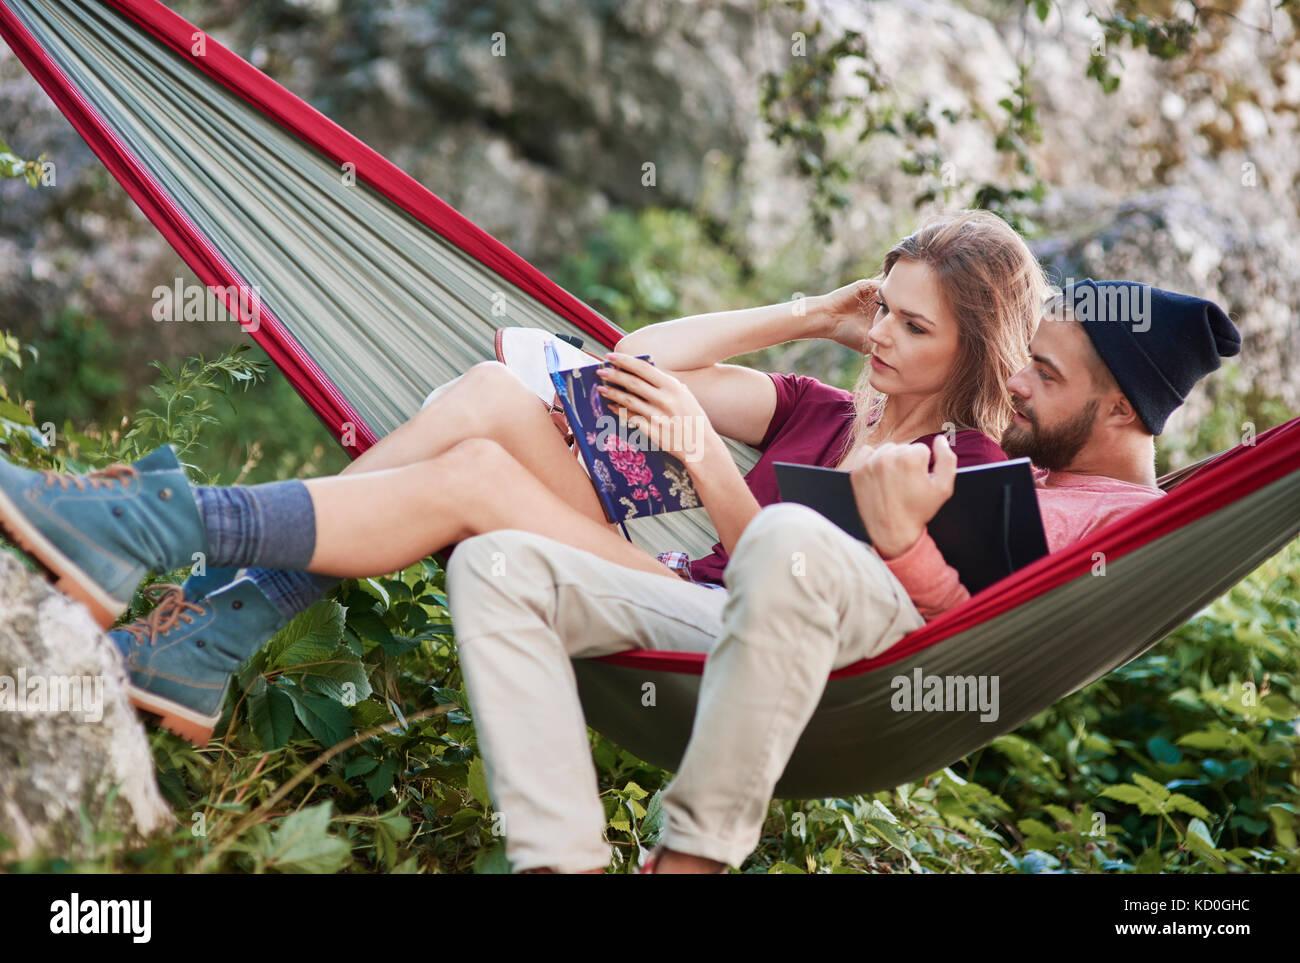 Couple relaxing in hammock reading books, Krakow, Malopolskie, Poland, Europe - Stock Image